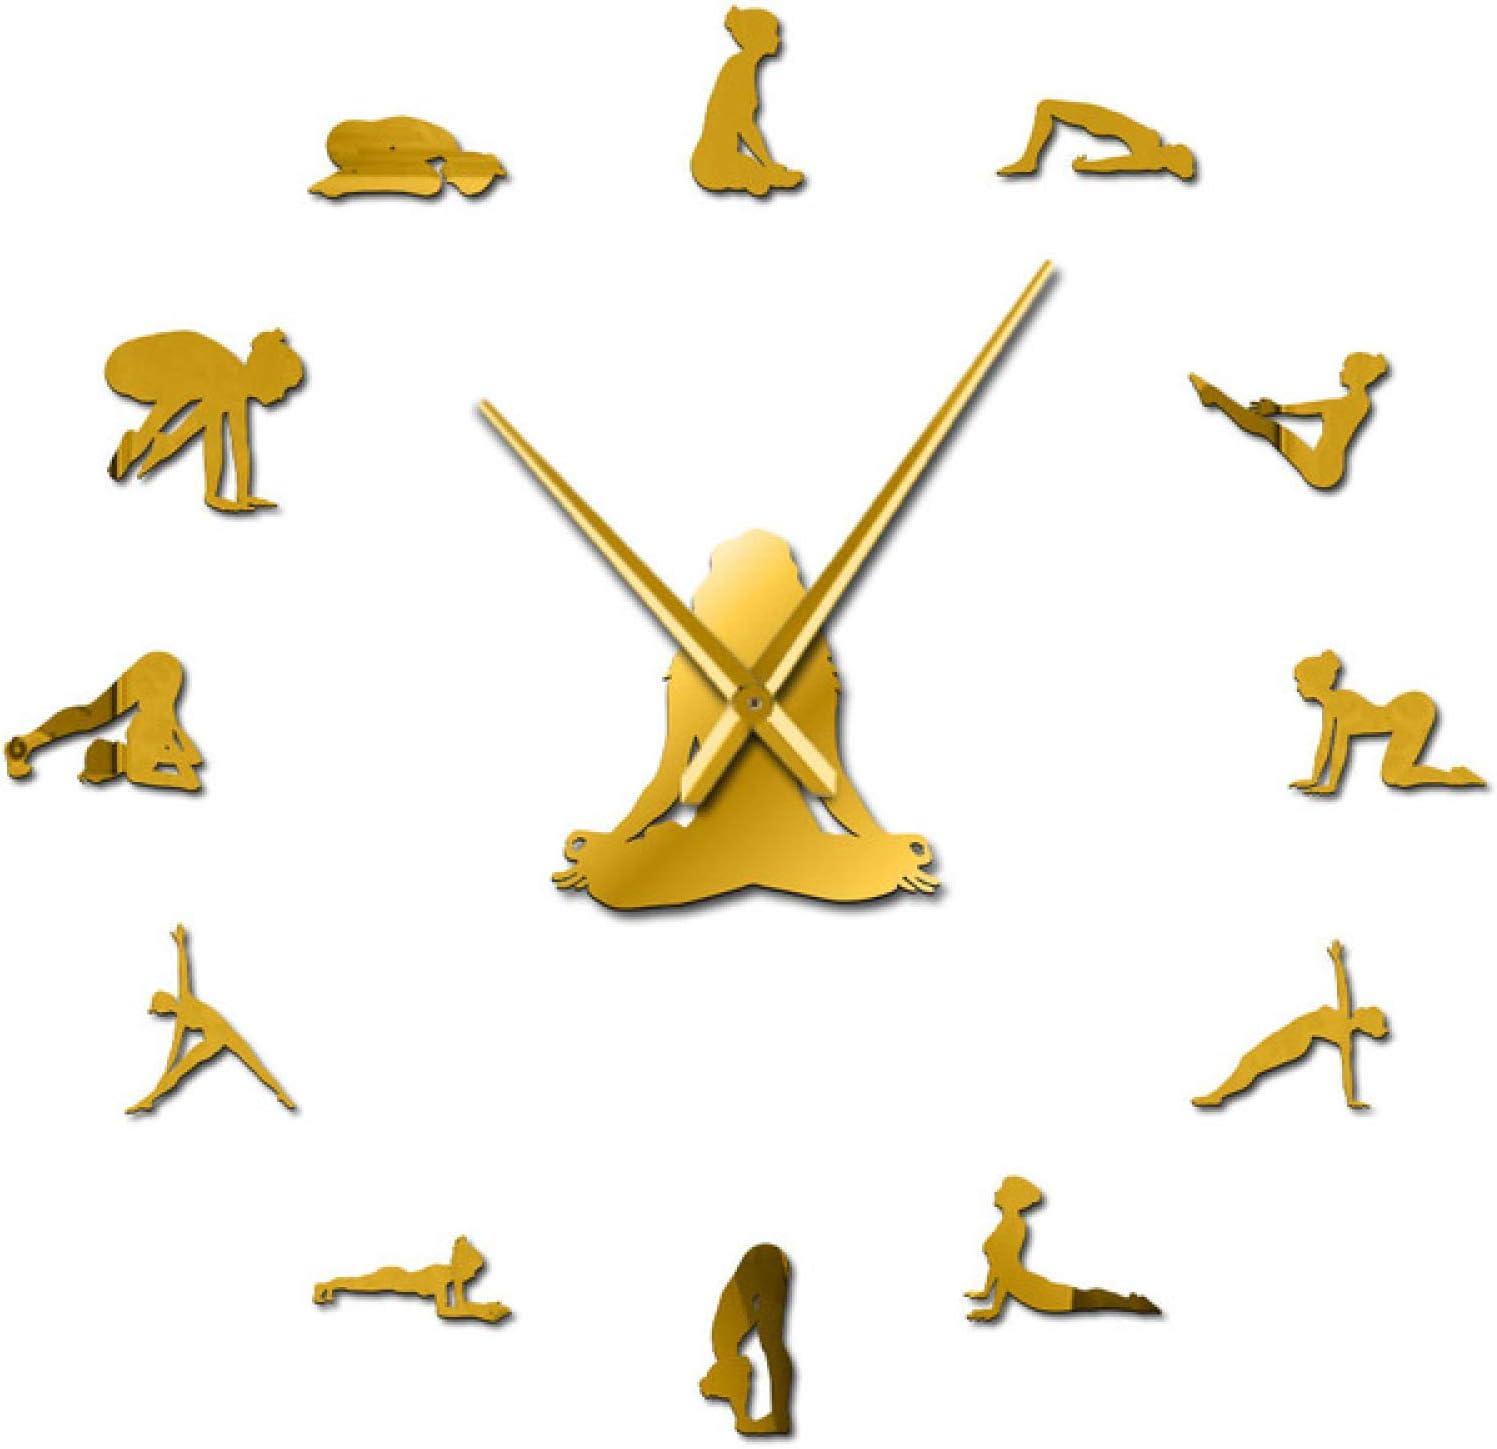 Xinxin Wall Clock Yoga Girl Design DIY 3D Acrylic Wall Clock Special Clock Fashion Home Decor Self Adhesive Quartz Mirror Sticker Gift for Her for Any Room in Home School Caravan Garage